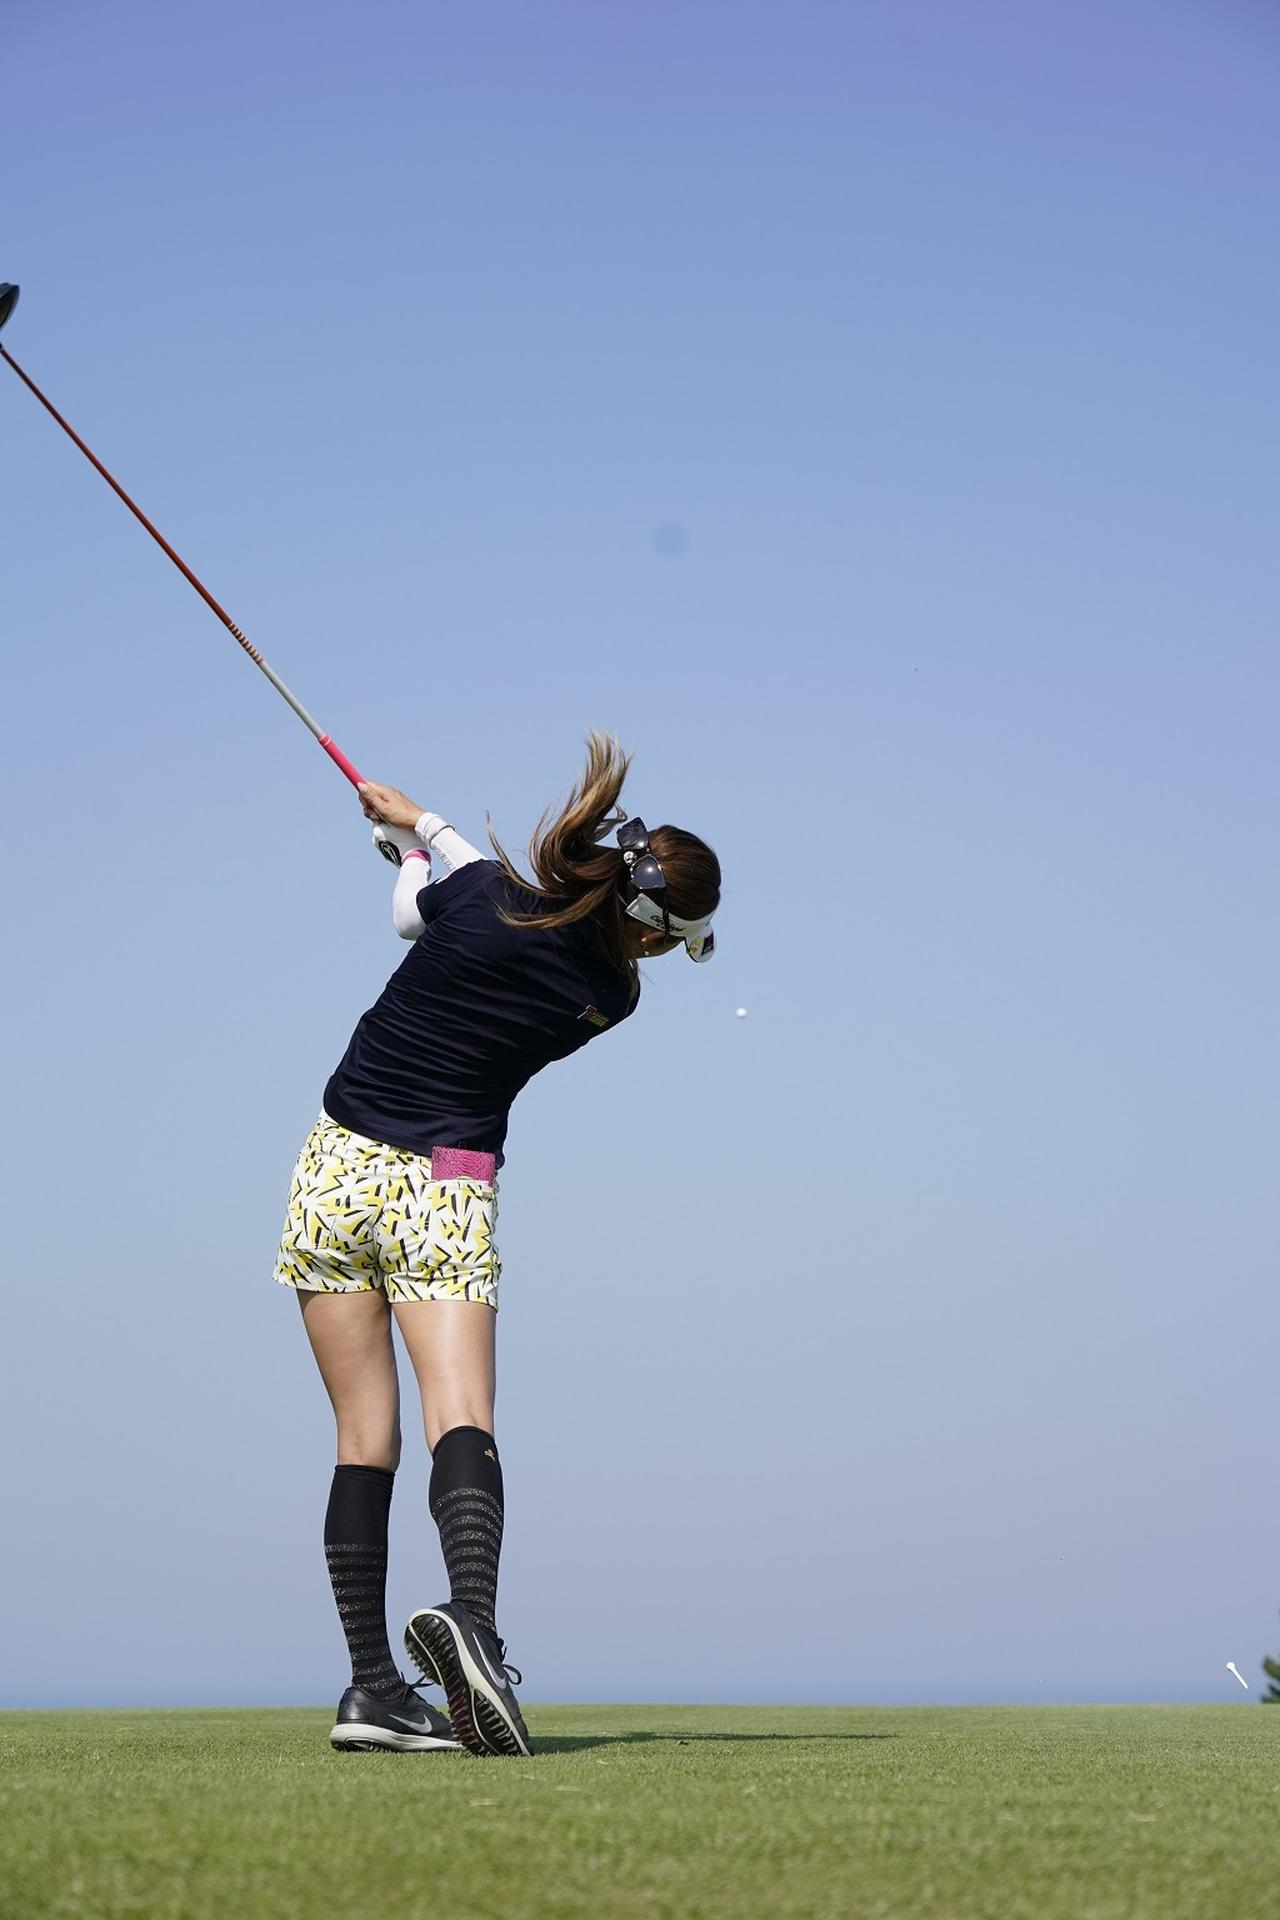 Images : 12番目の画像 - 金田久美子ドライバー後方連続写真 - みんなのゴルフダイジェスト